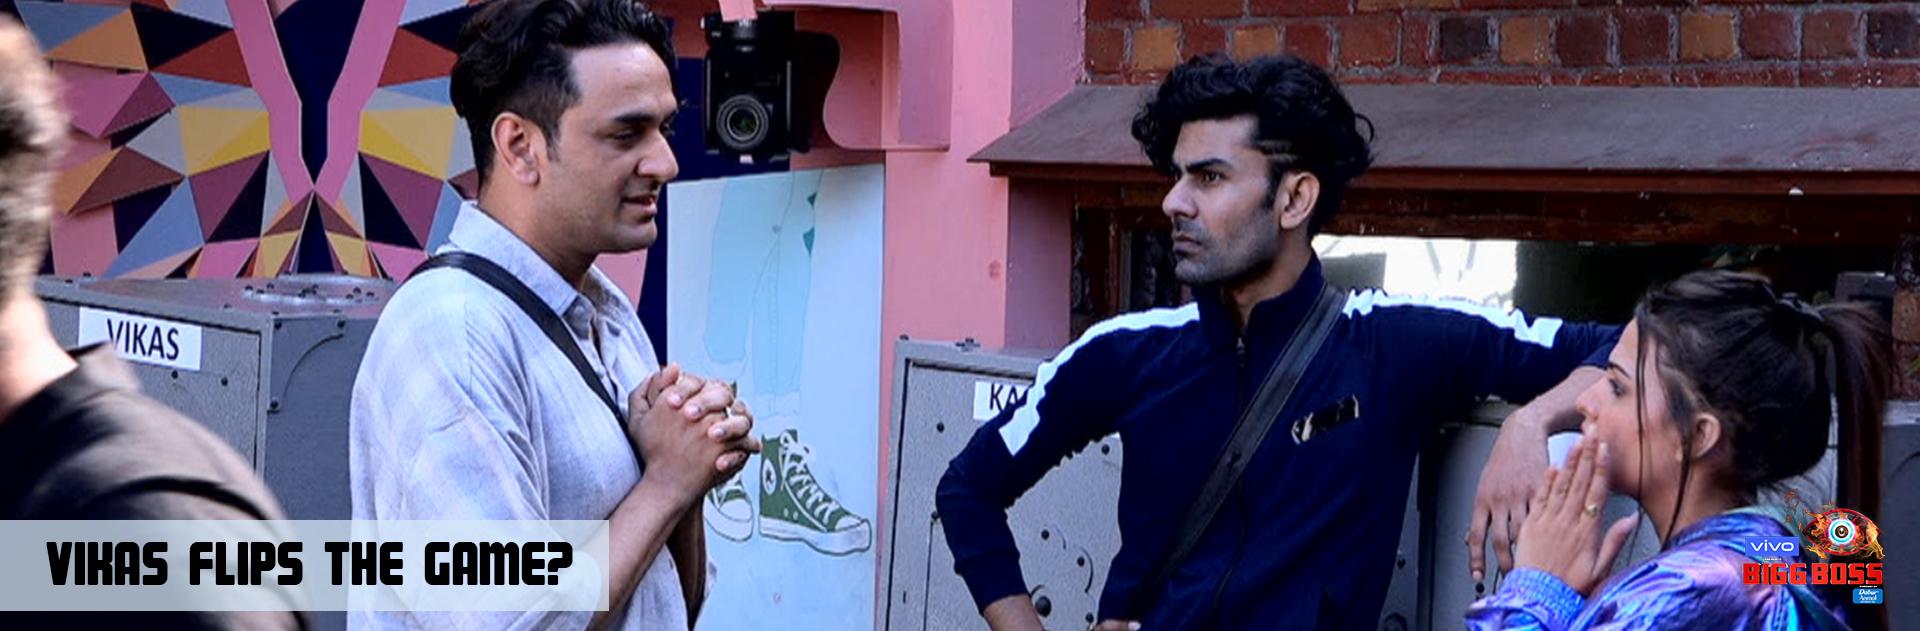 Mastermind Vikas Gupta turns around the 'Noton ki Baarish' task